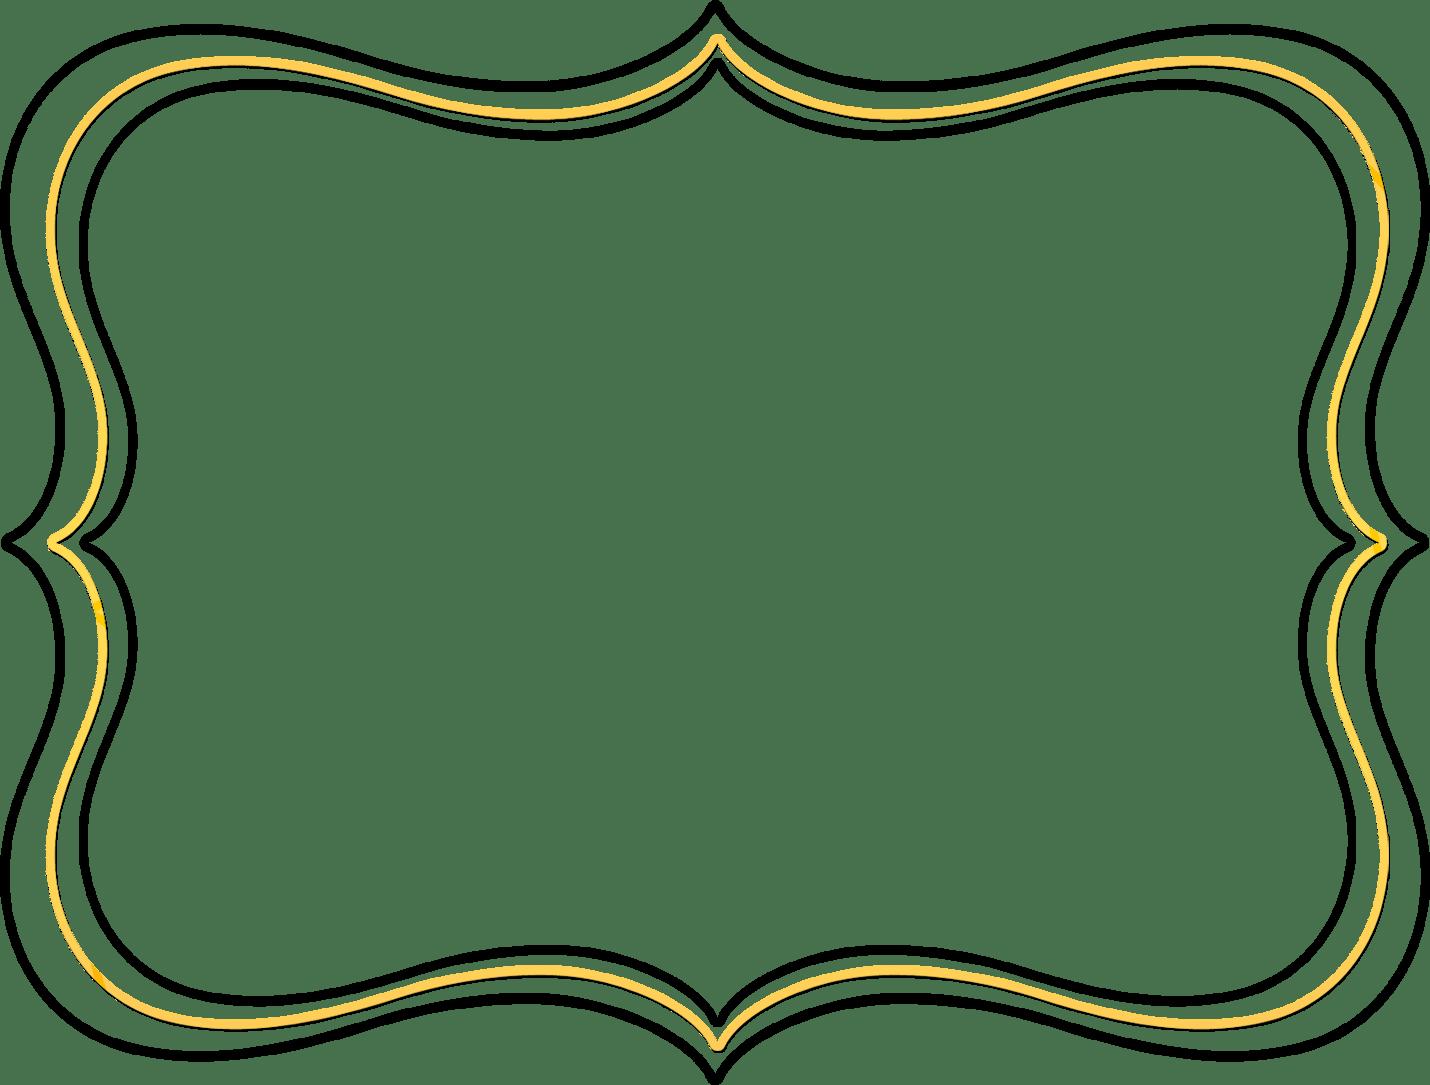 Ideal vistalist co. Scroll clip art frame